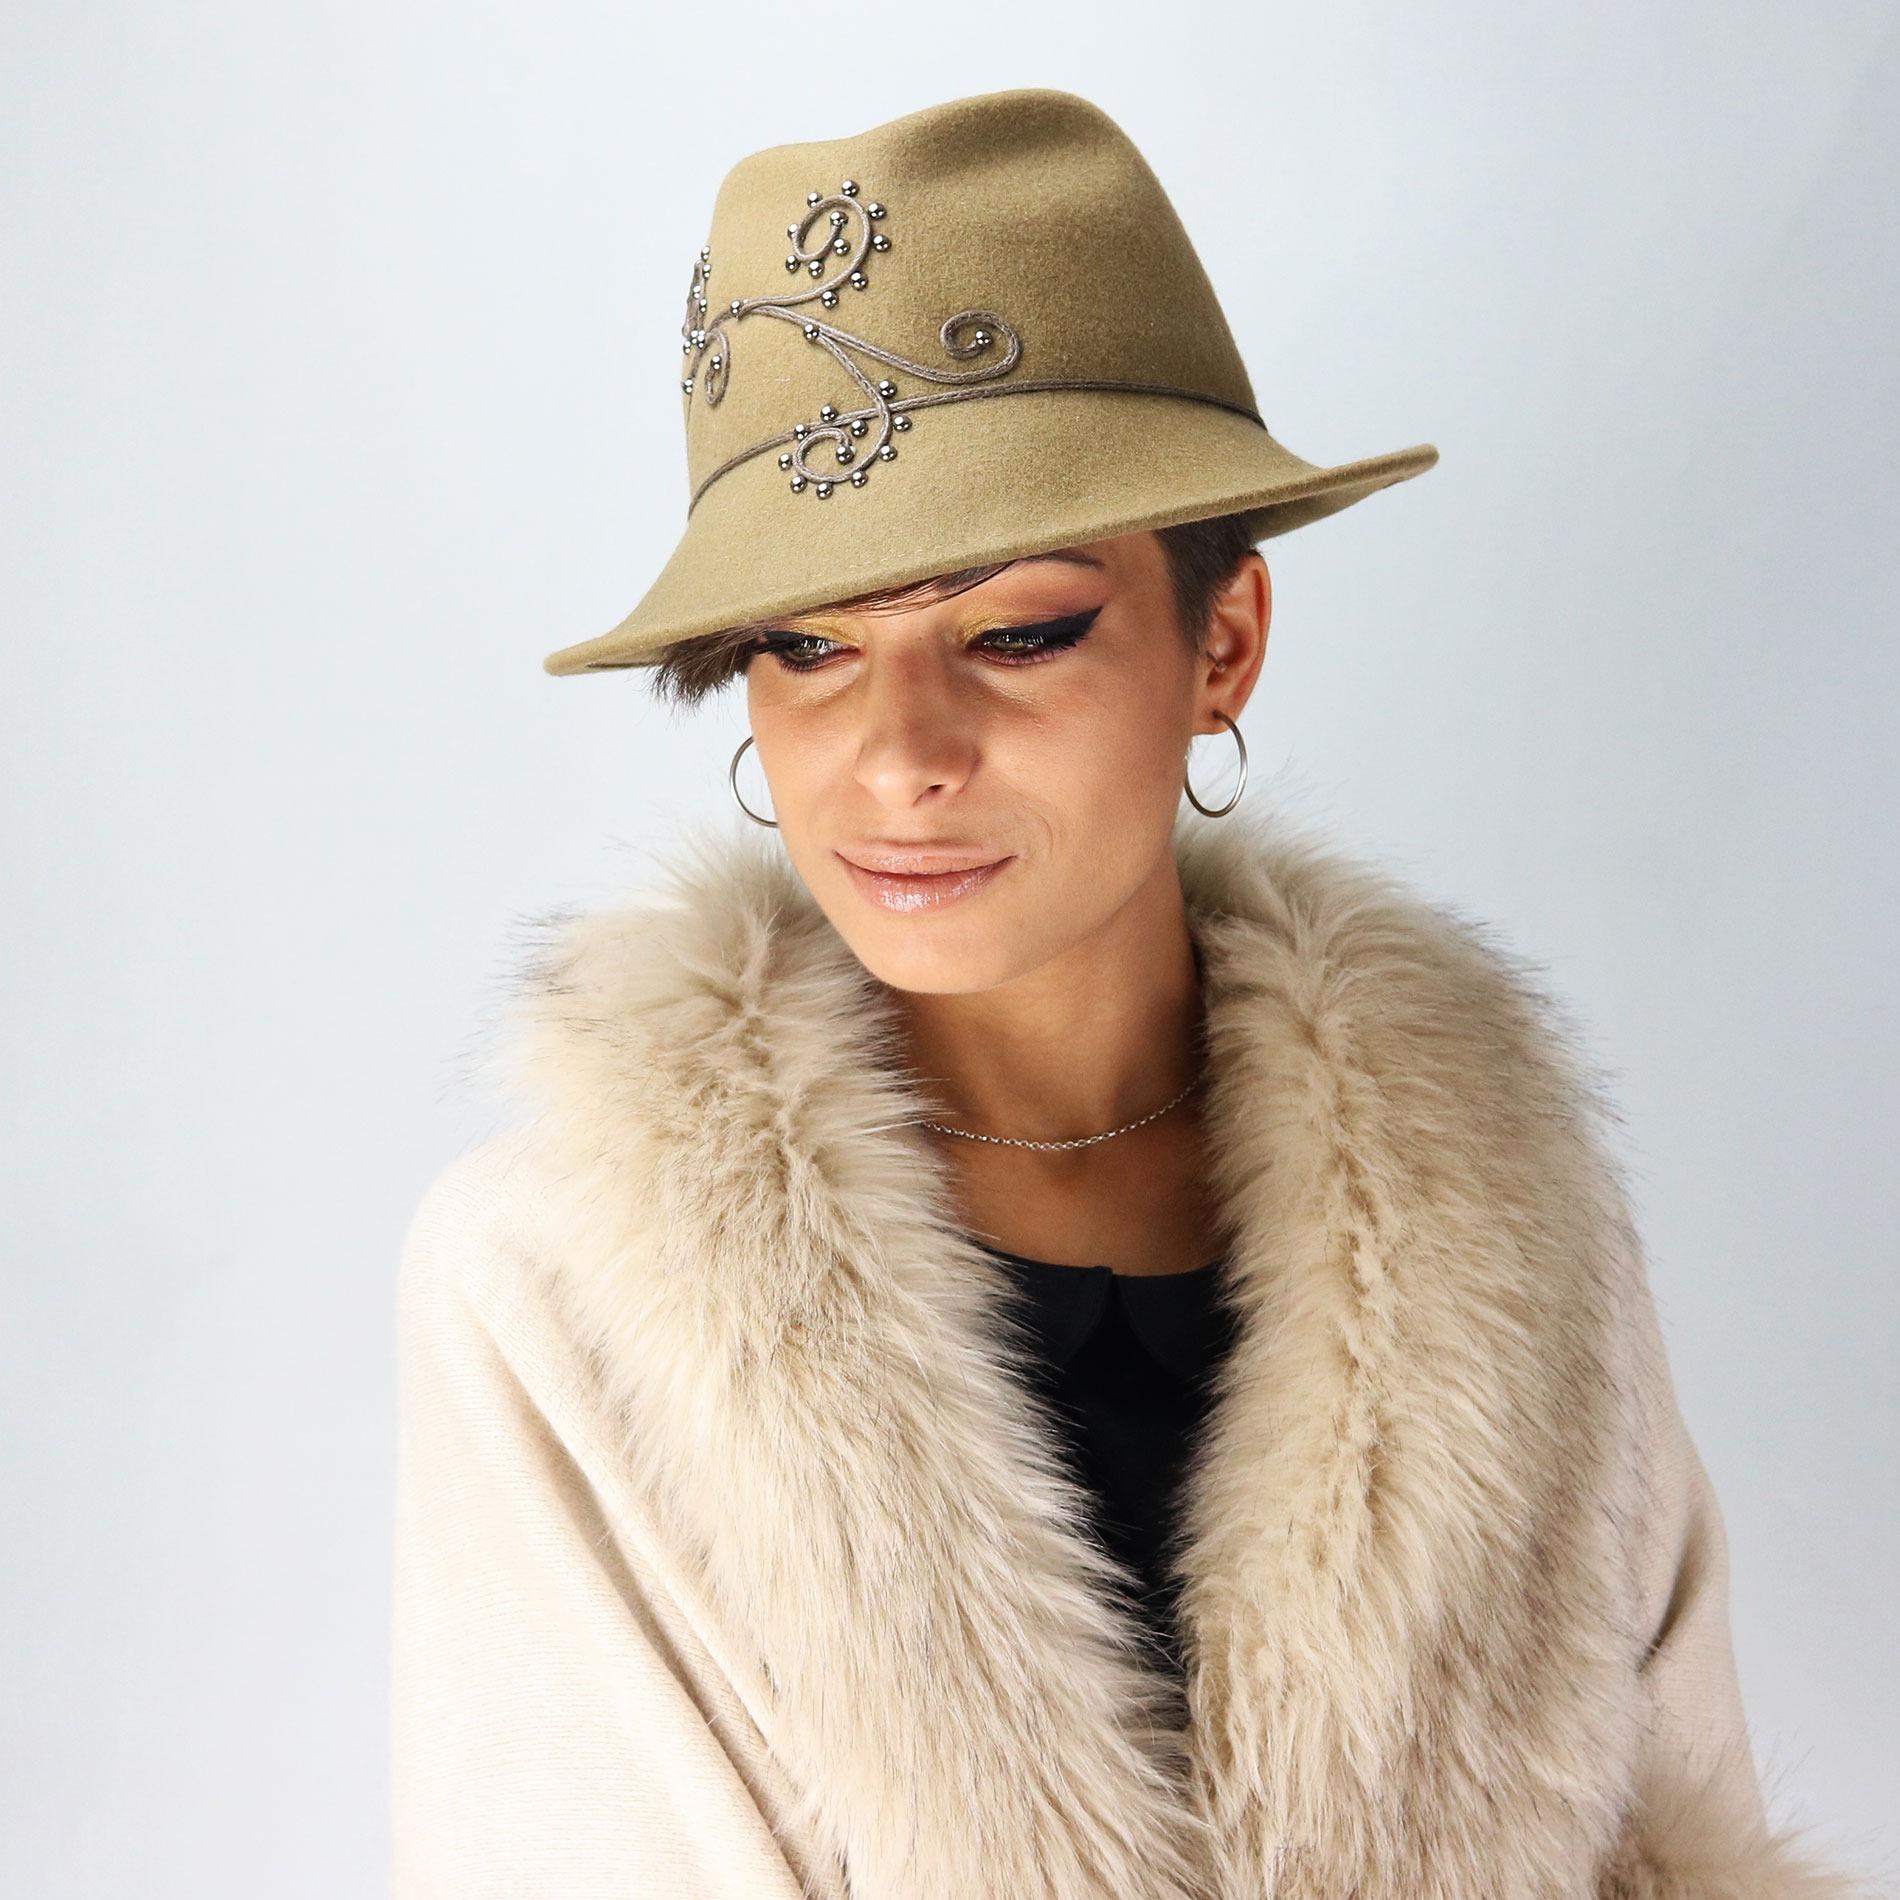 Fall winter collection - Women s borsalino hat in felt fabric 0ab3e7e2ecd6